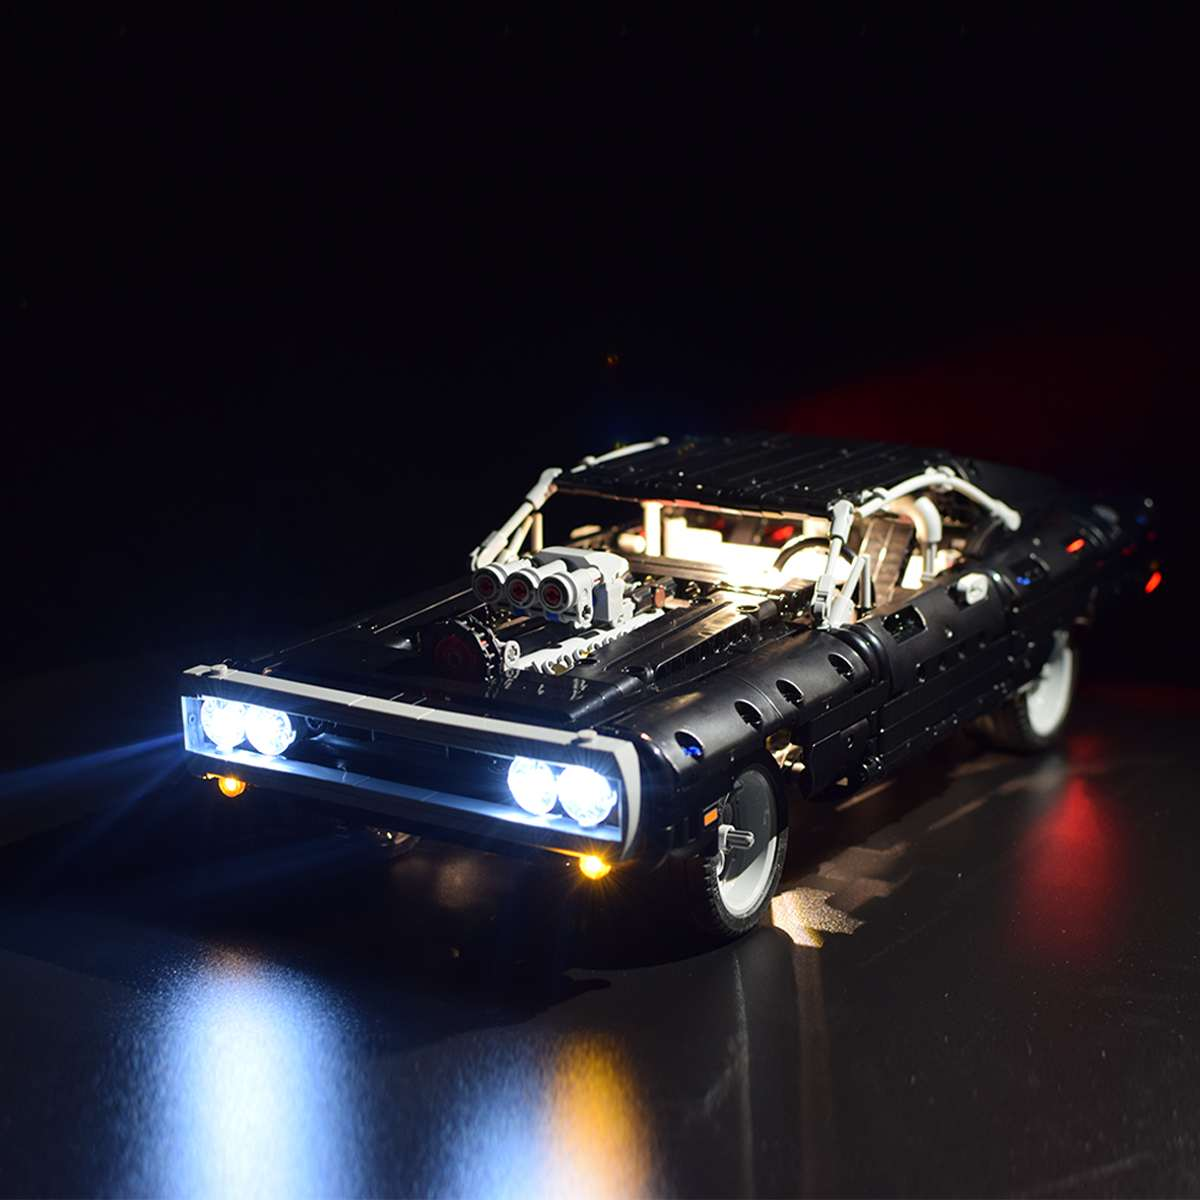 LED Light Up Kit For 42111 Technic For Doms For Dodge Charger Car Bricks Toy (Model Not Included) Lighting Set